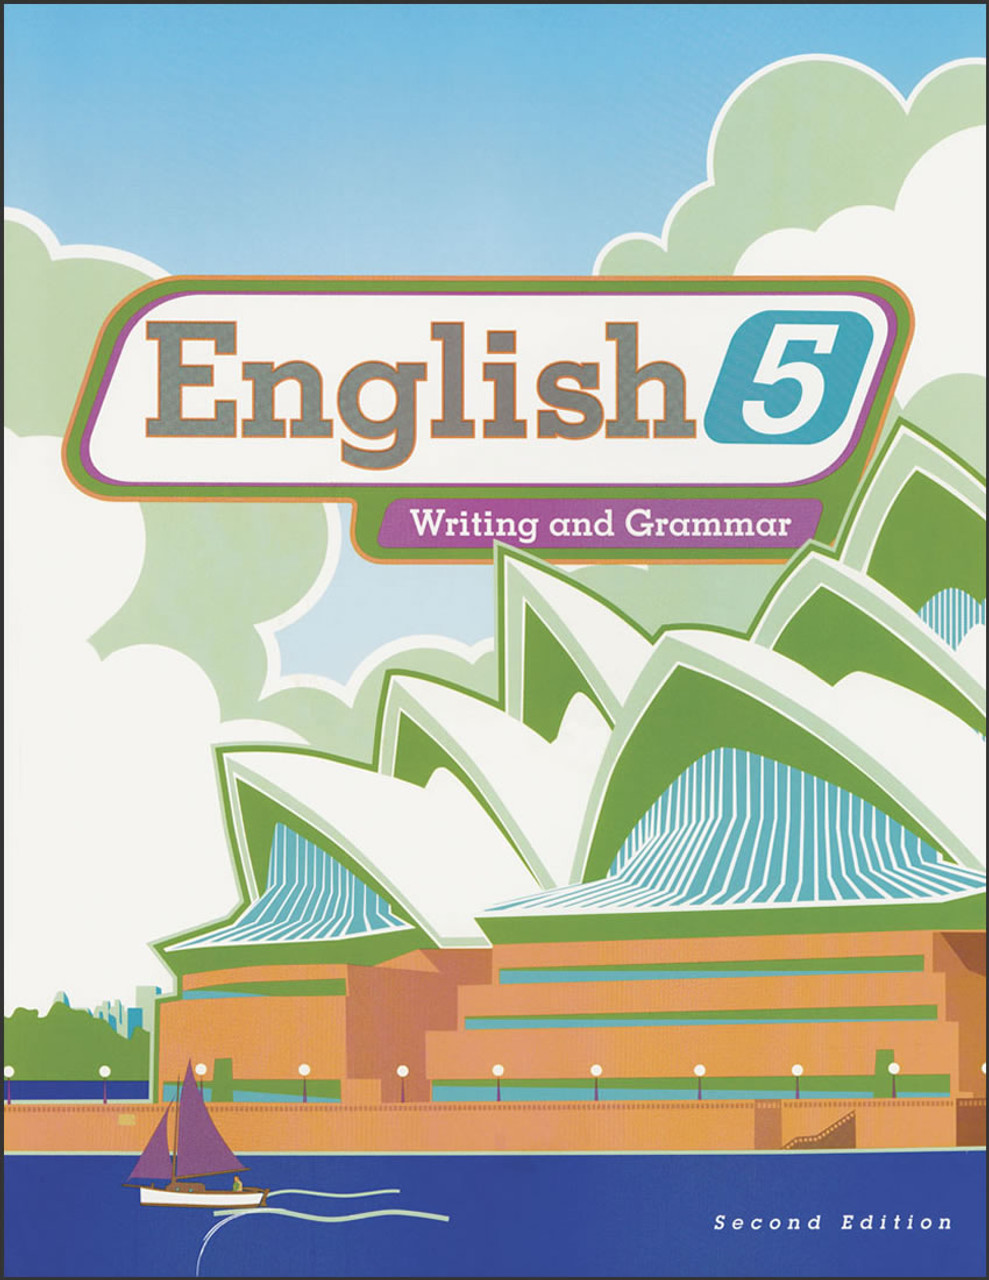 English 5, 2nd edition